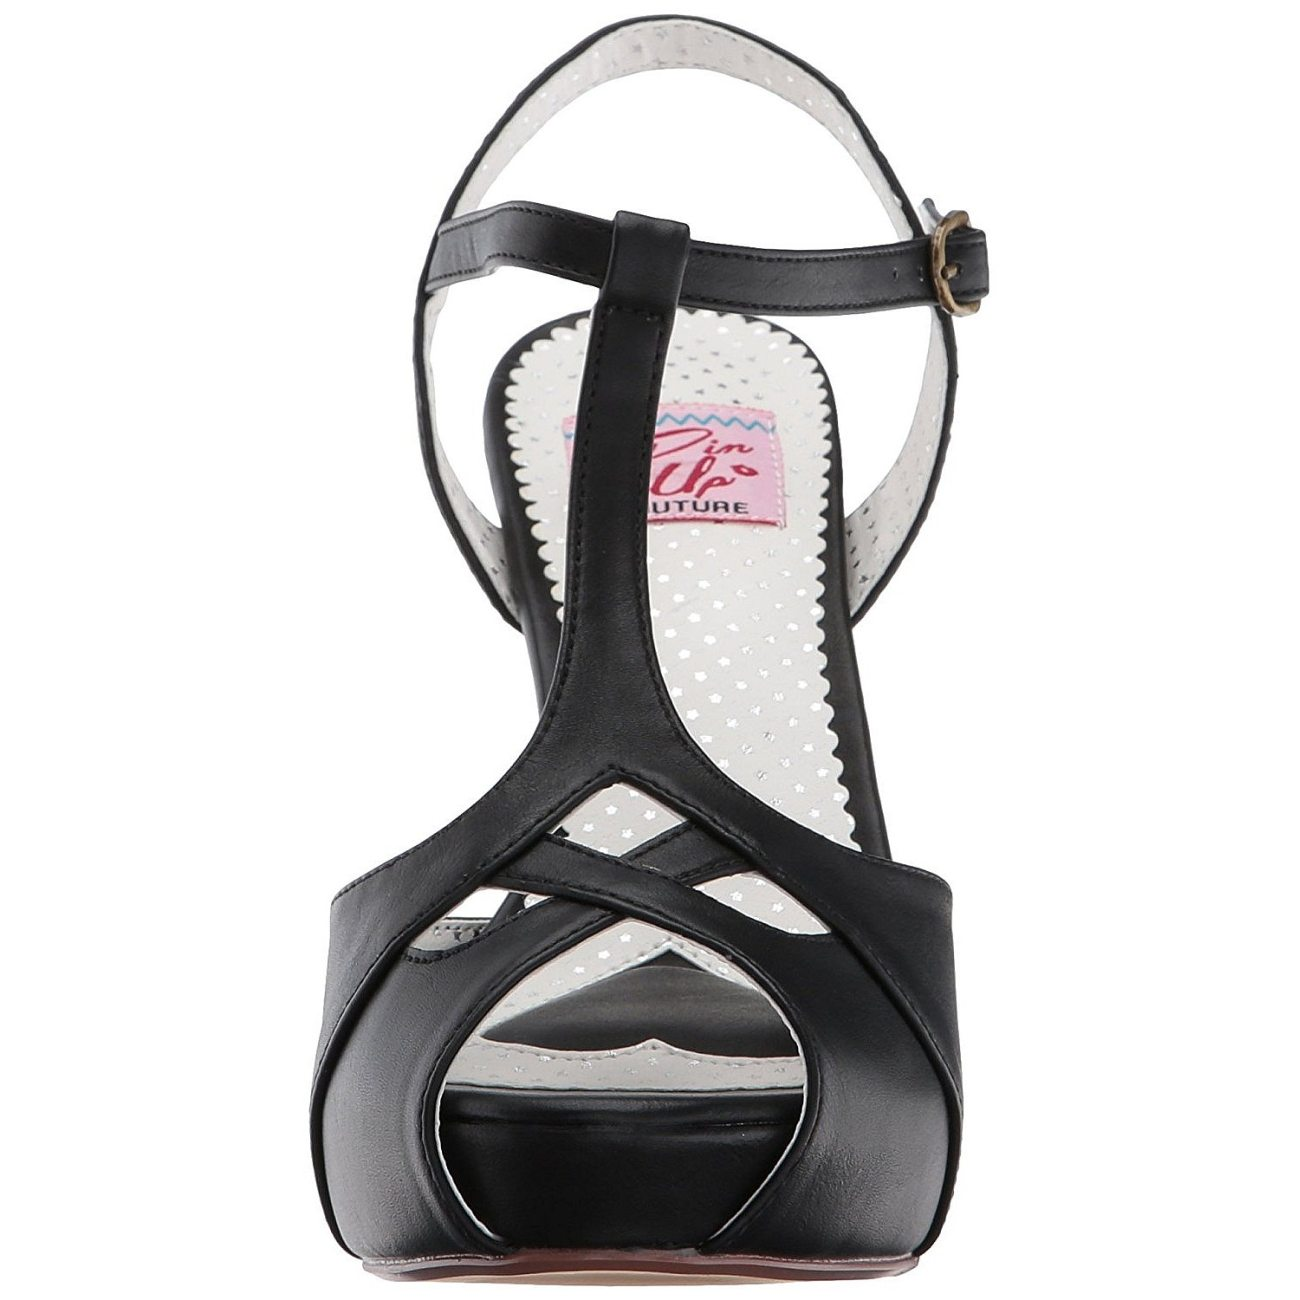 5 Cm Bettie High Sandals Evening Heeled 23 Black 11 nyNPmwOv80